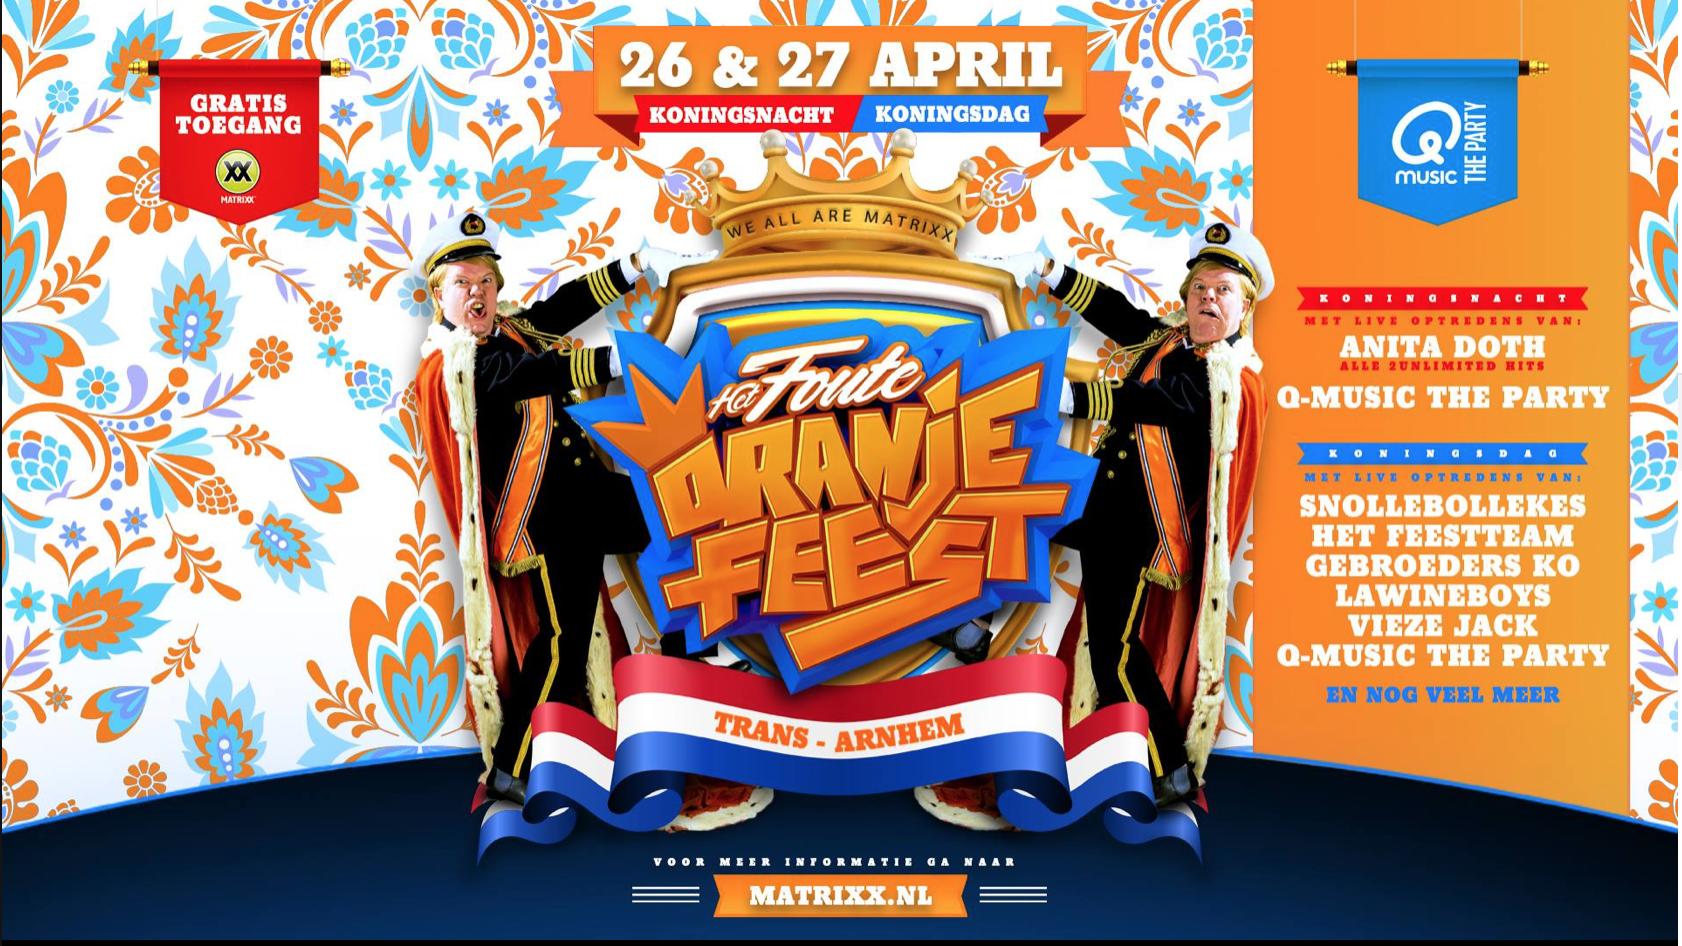 eb7b7e8fb05 King's Day & Night events Arnhem - ArnhemLife party agenda